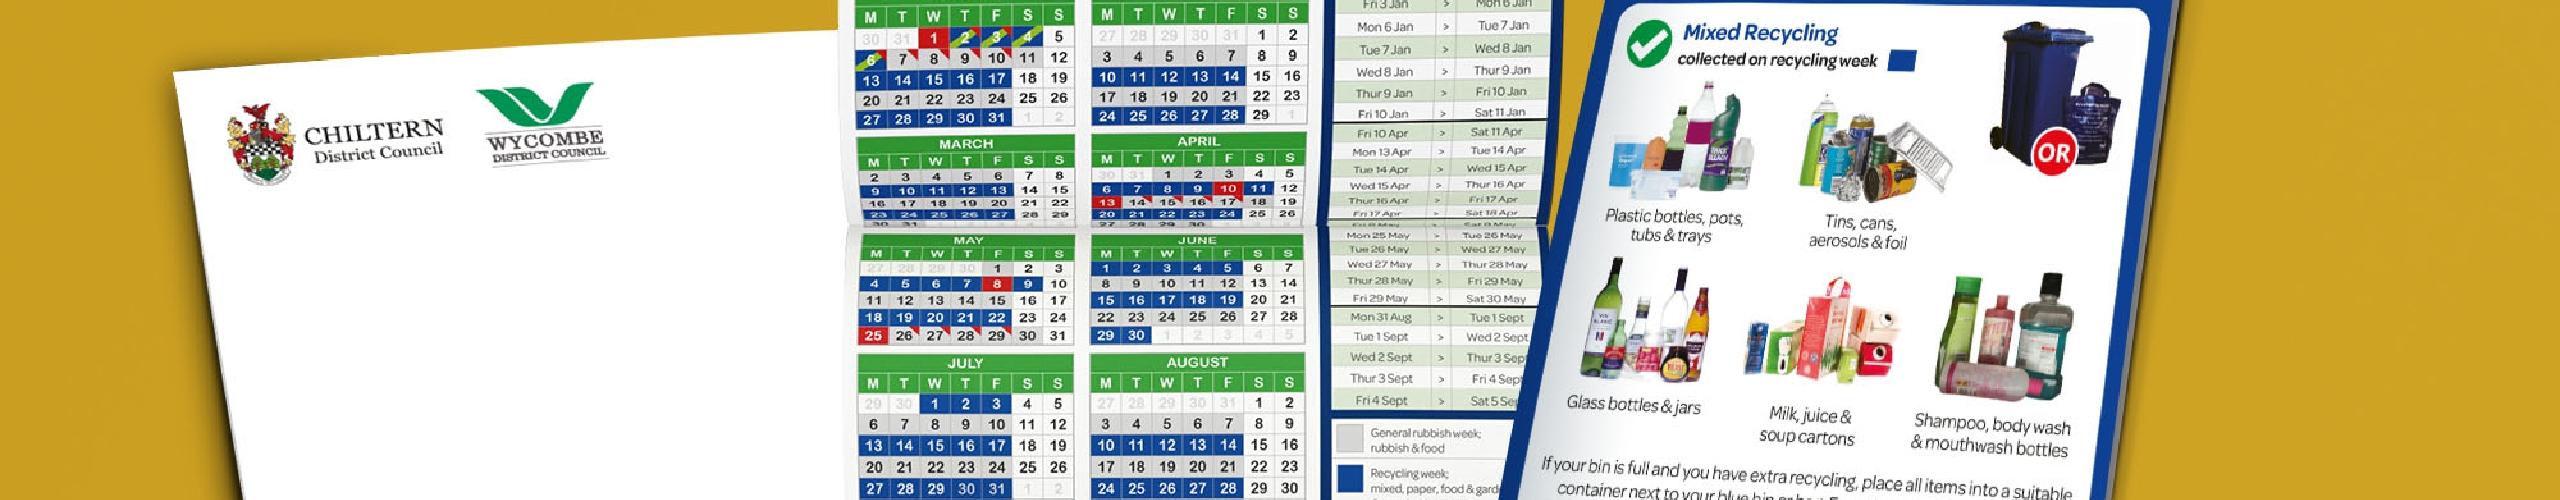 CDC Waste Calendar